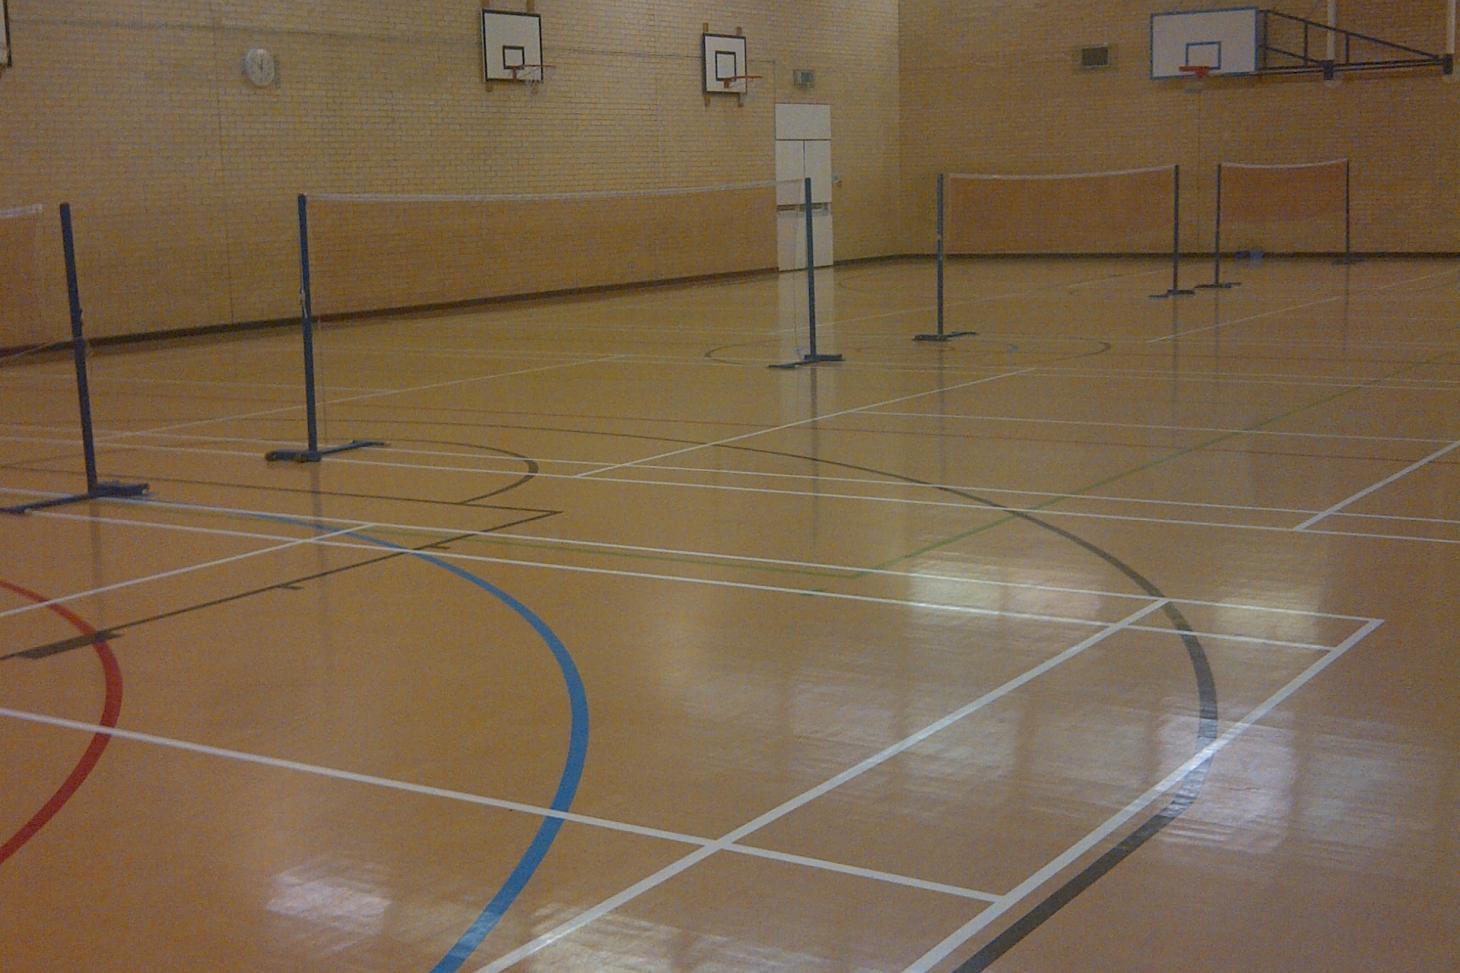 Becket Sports Centre Indoor basketball court